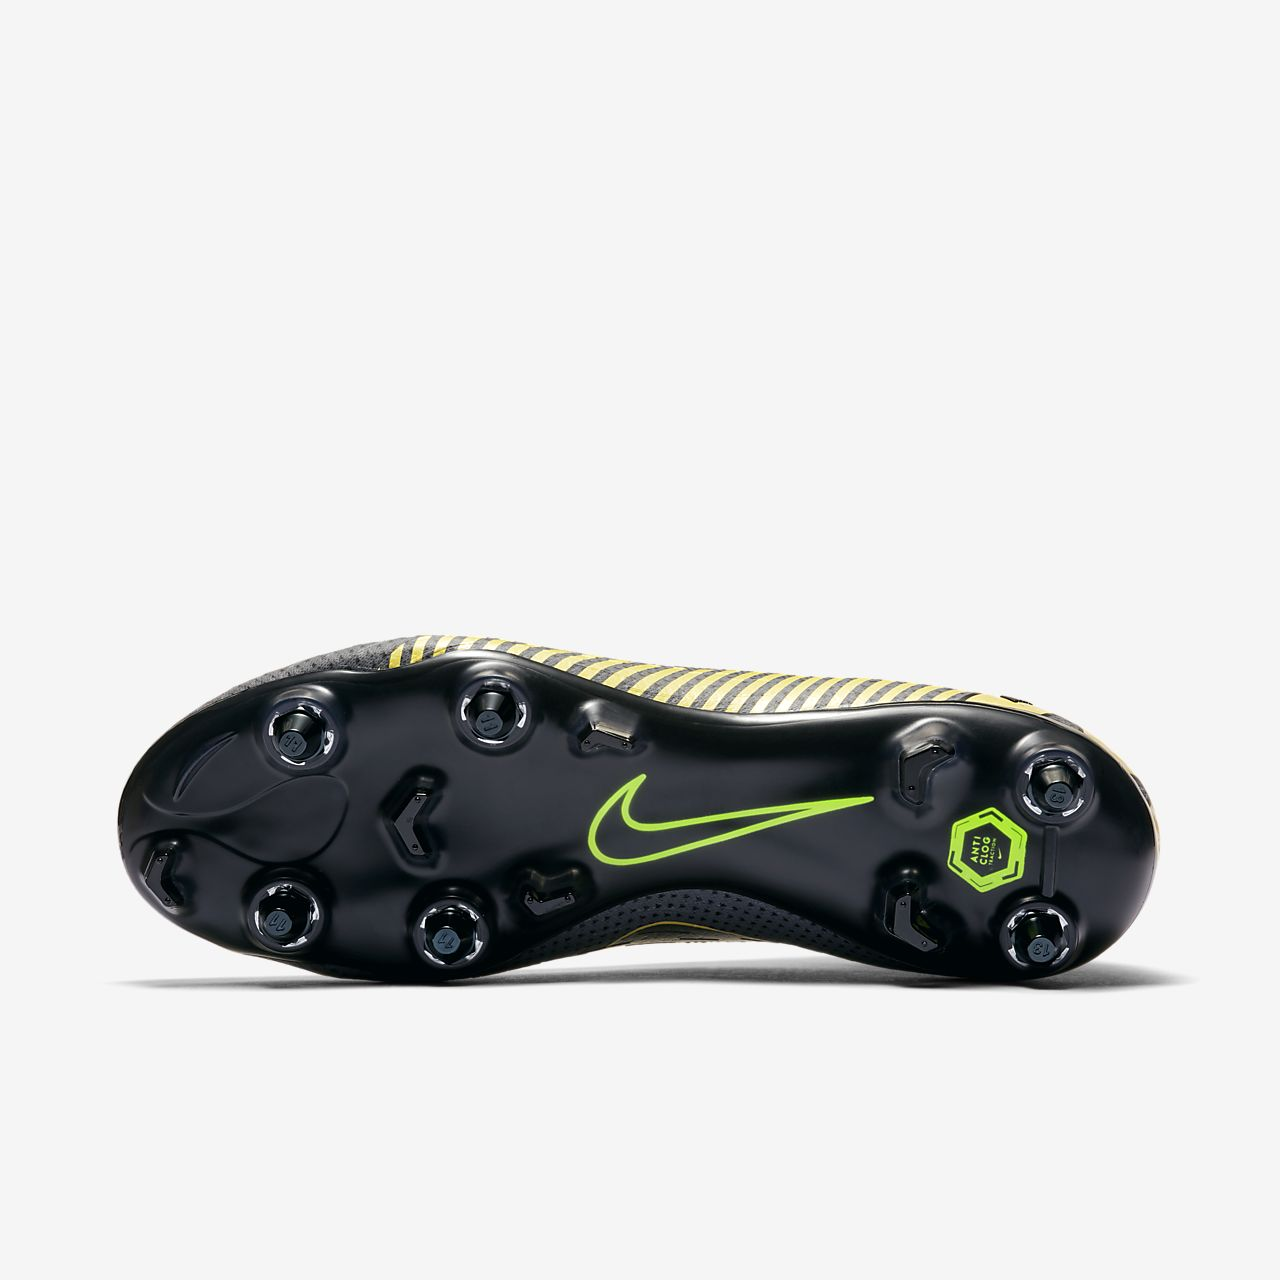 09122561b735 ... Nike Mercurial Superfly 360 Elite SG-PRO Anti-Clog Soft-Ground Football  Boot